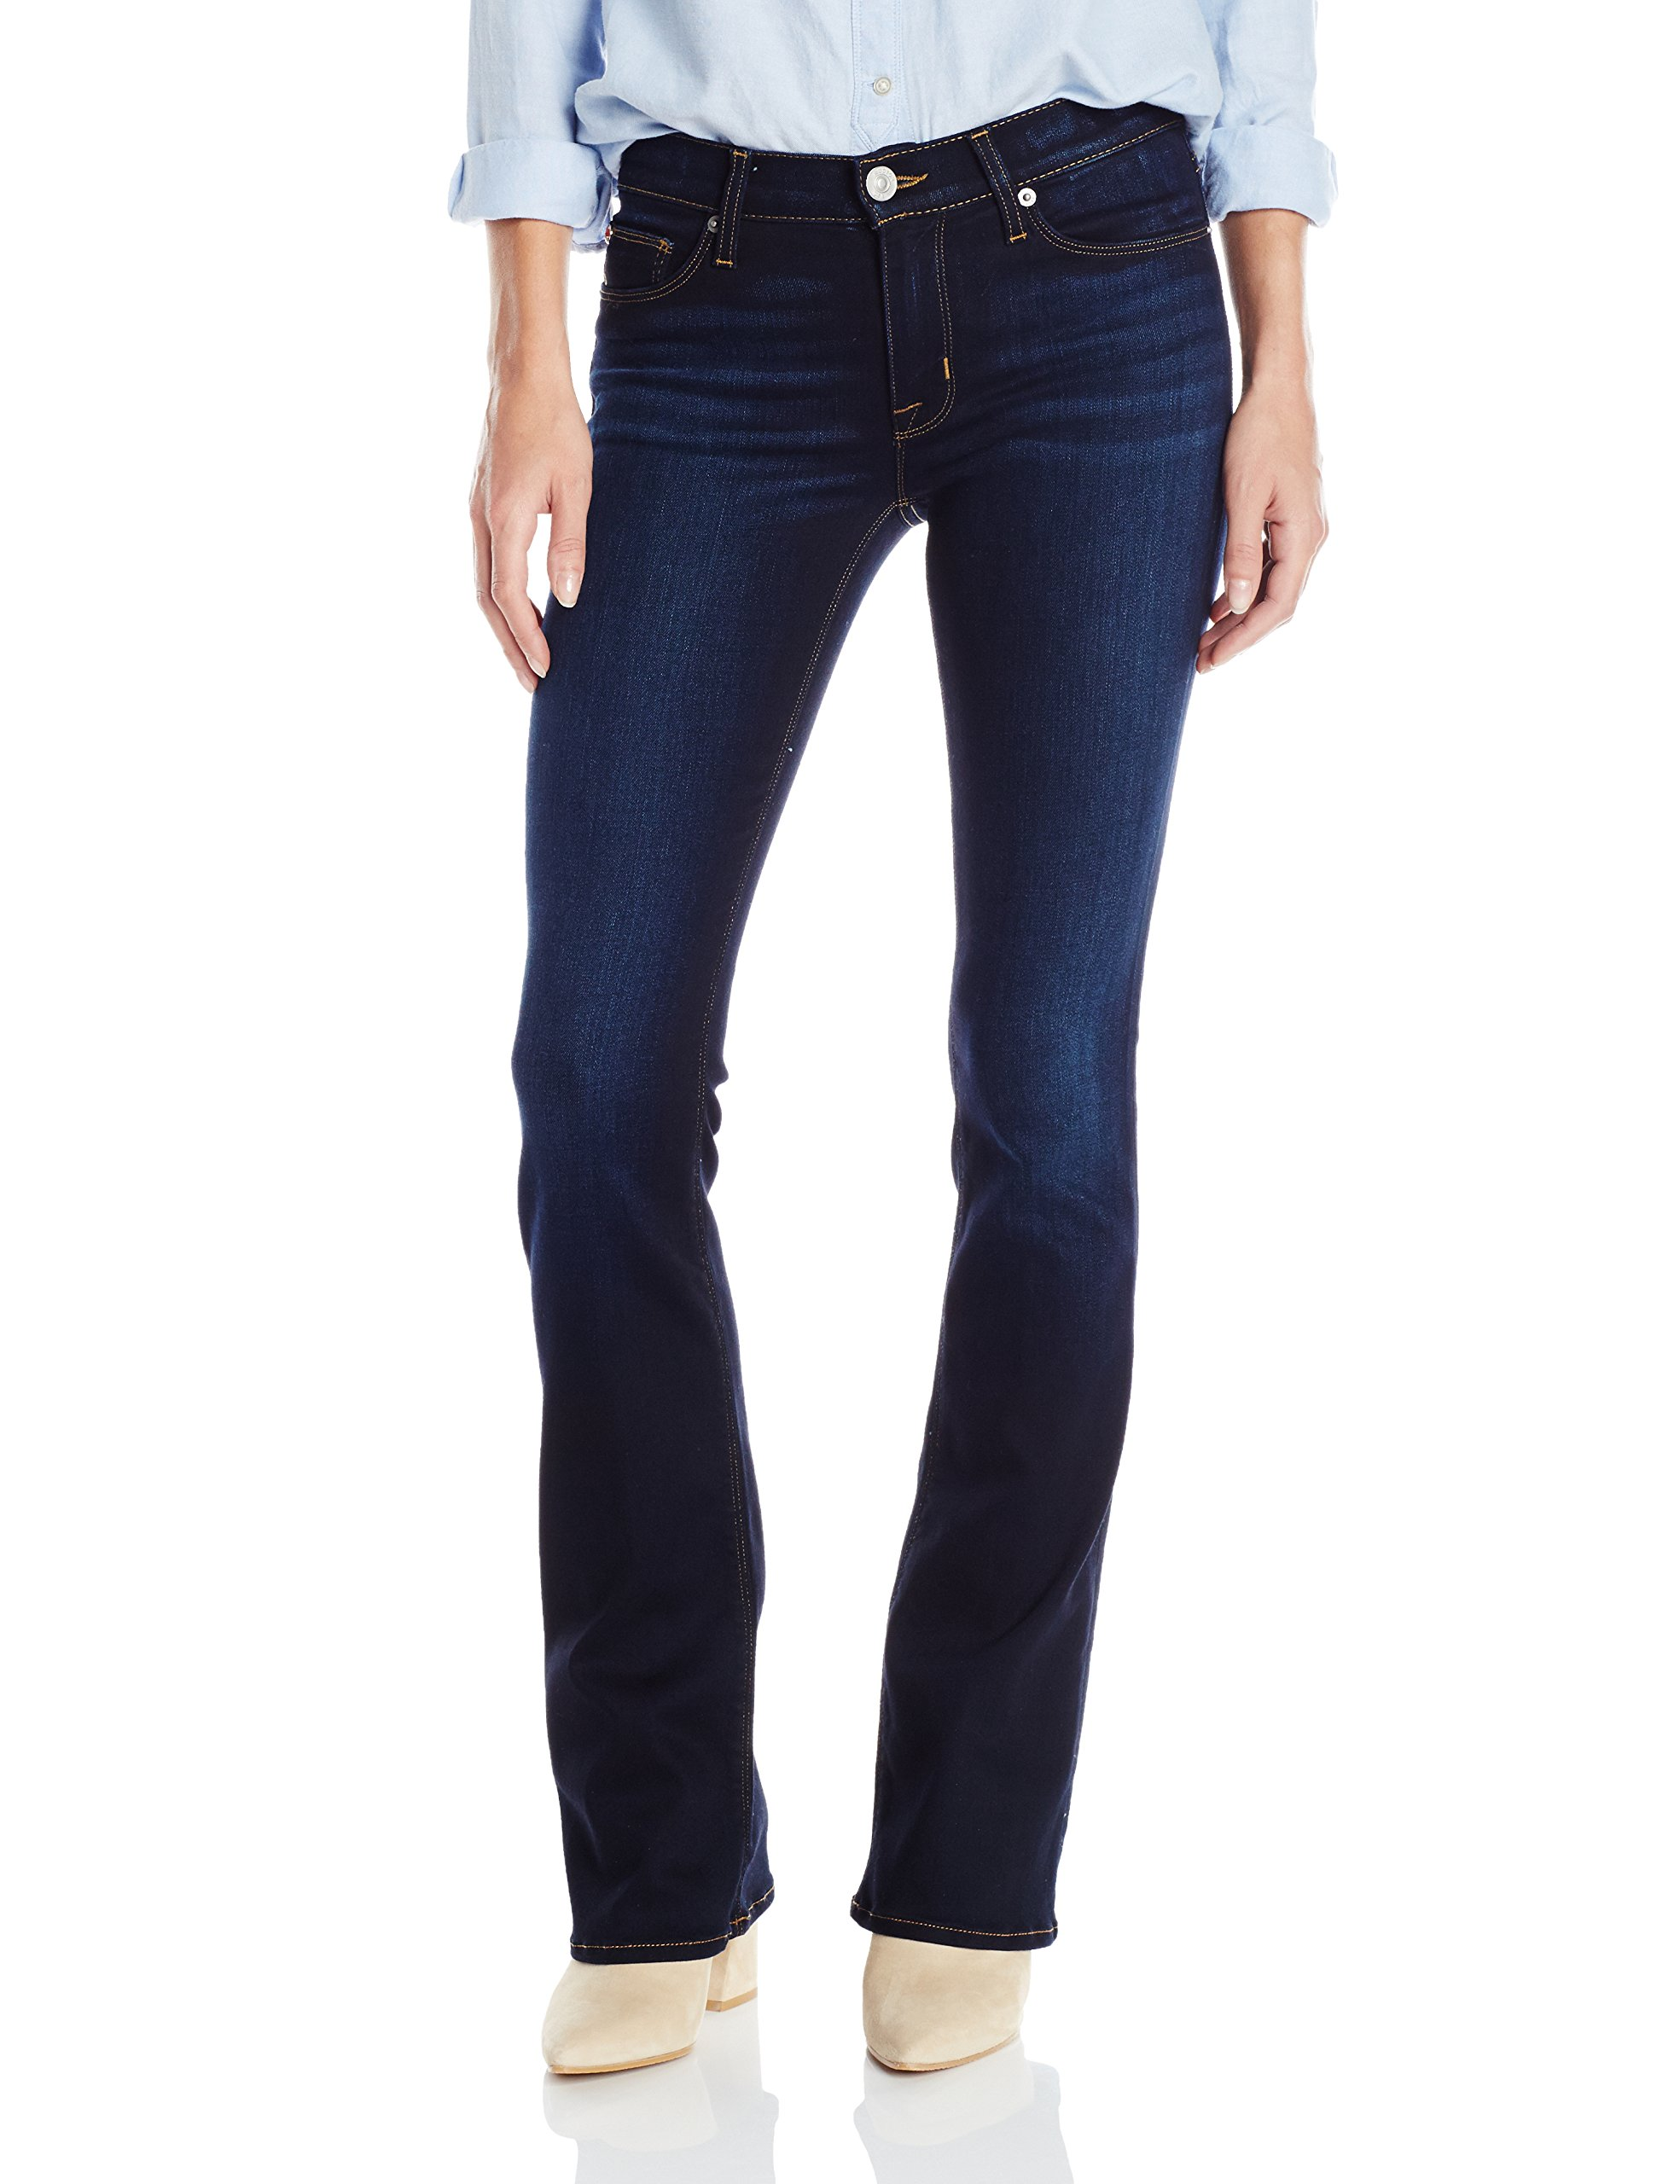 HUDSON Jeans Women's Petite Love Midrise Bootcut 5 Pocket Jeans, Redux, 28